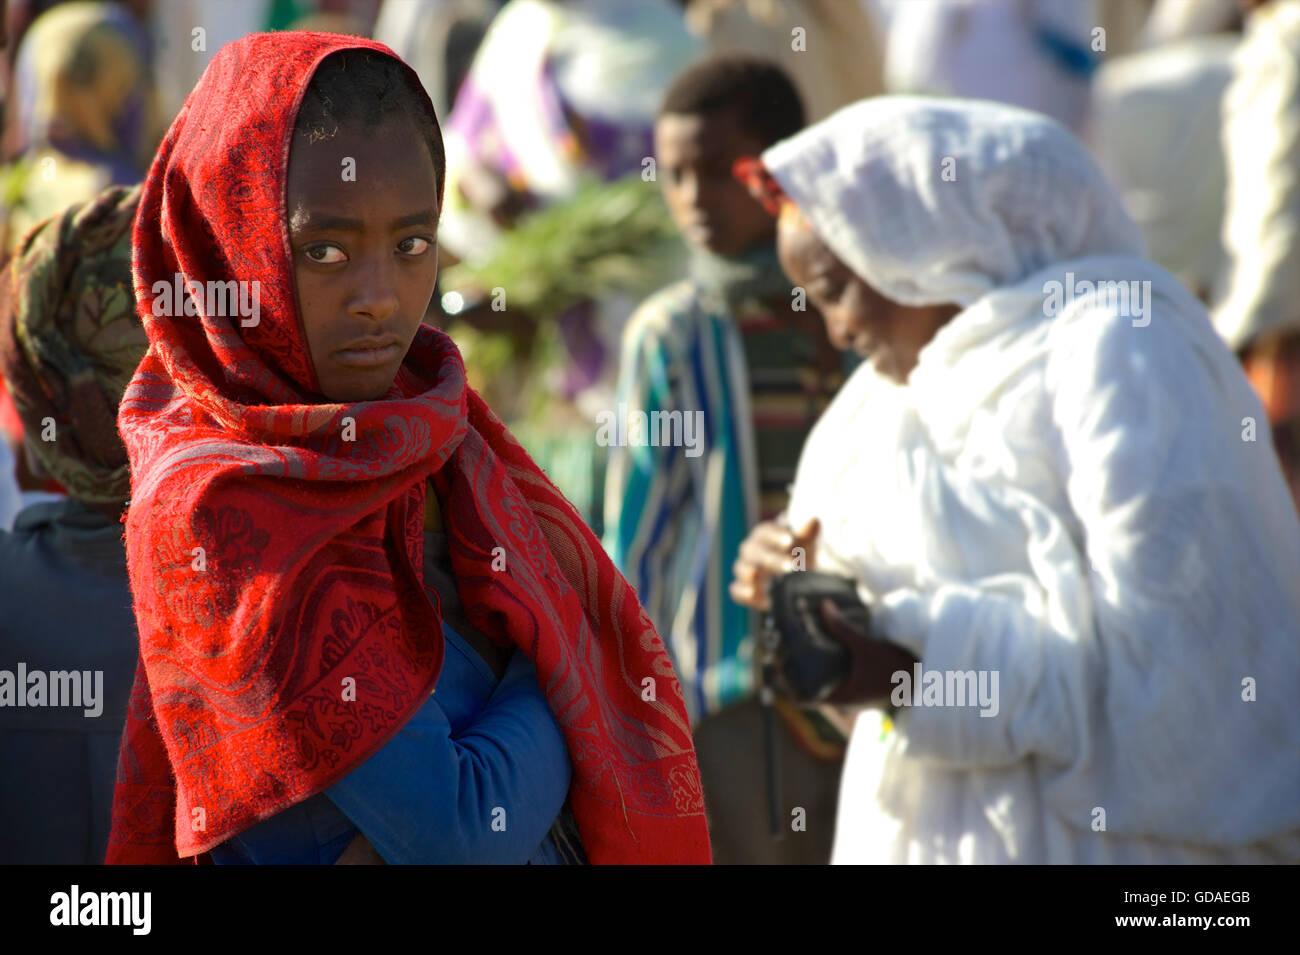 Ethiopian Christian girl in headcloth at Palm Sunday festivities, Axum, Tigray, Ethiopia. - Stock Image